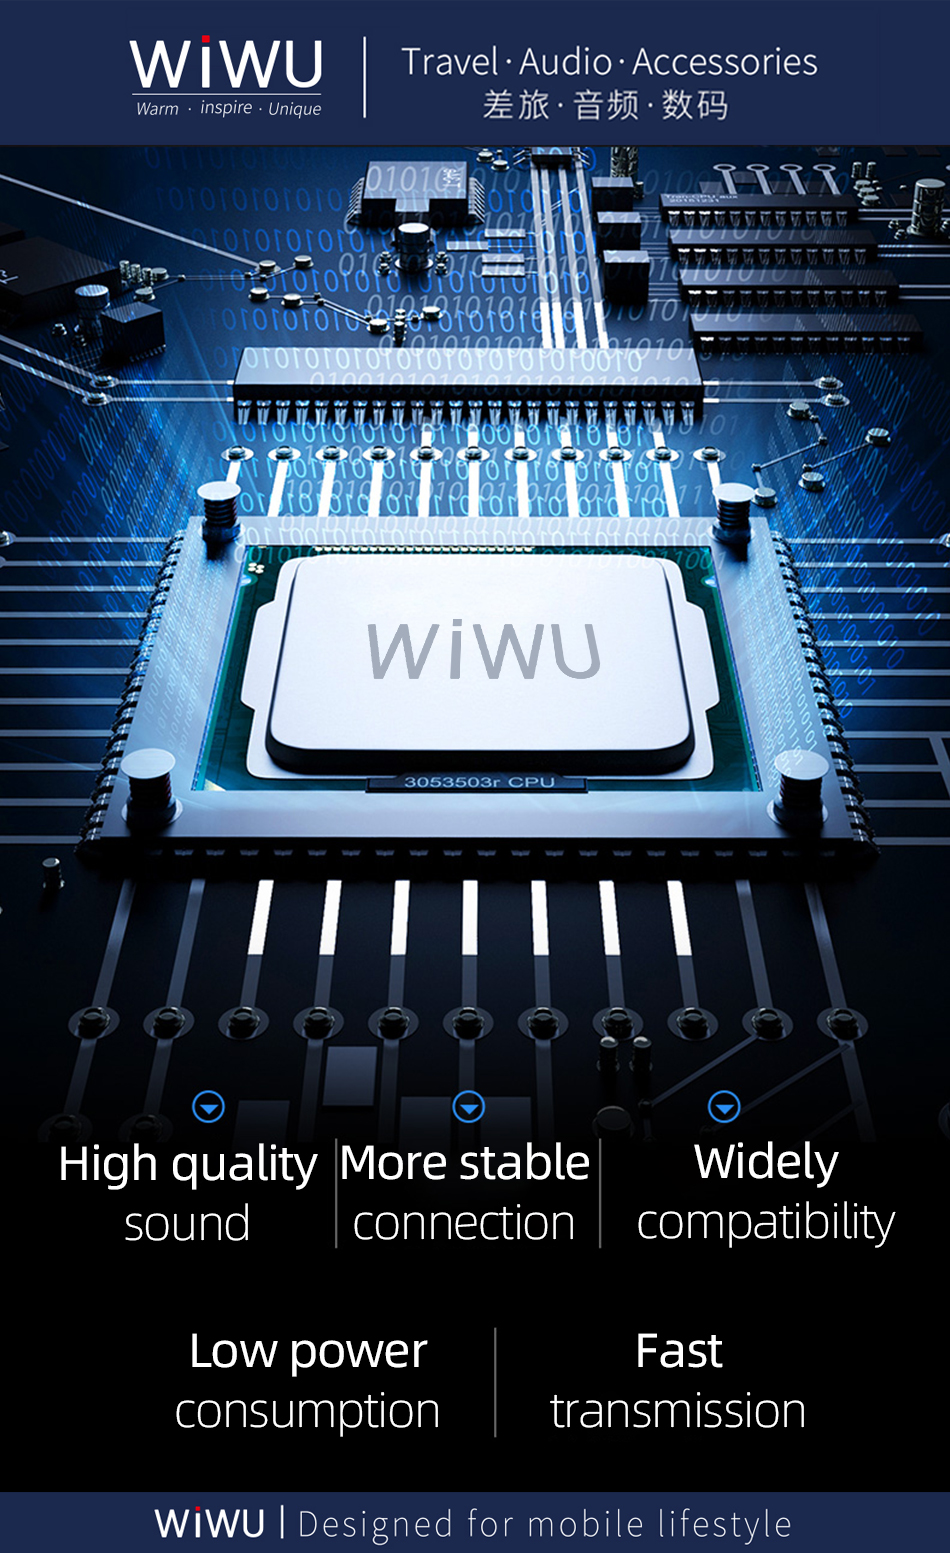 WIWU Wholesale Lighting USB Audio Adapter Earphones Splitter Double Jack Aux Audio Adapter for i Phone